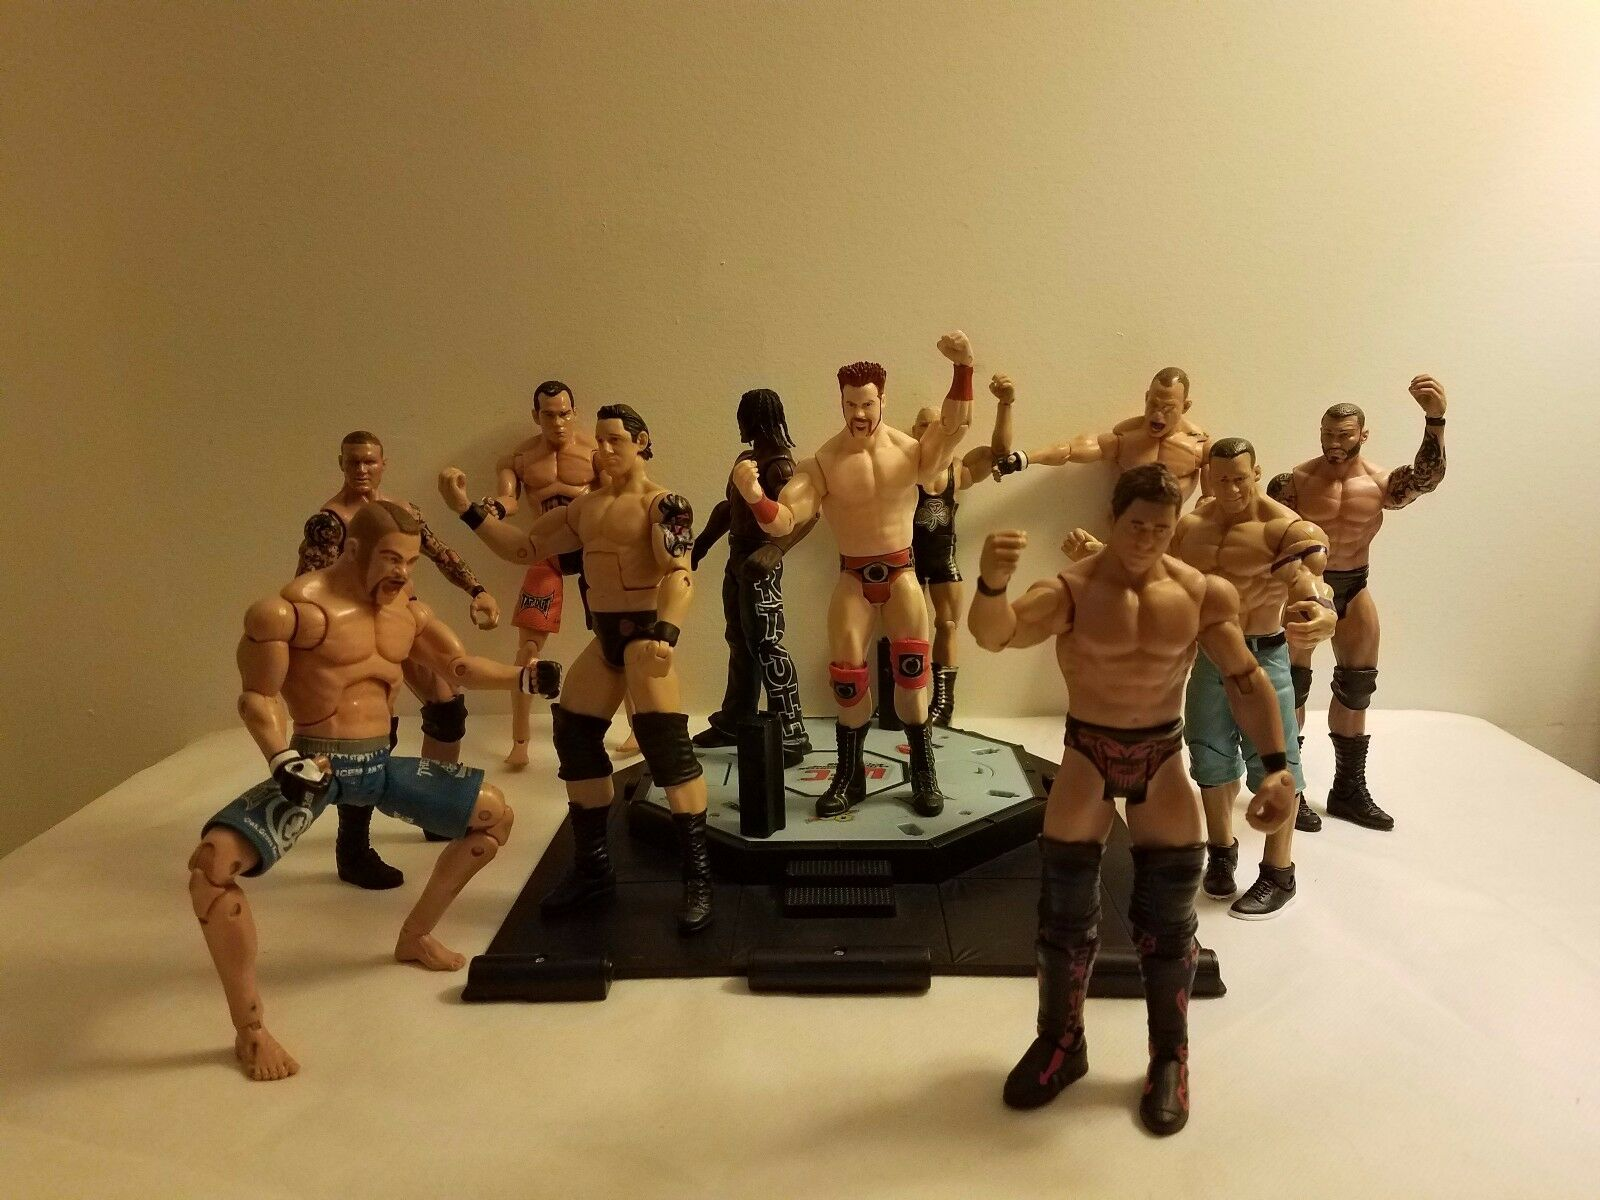 WWE Wrestling Ring 8 Figures and 3 Figures Zuffa Jakks Pacific MMA